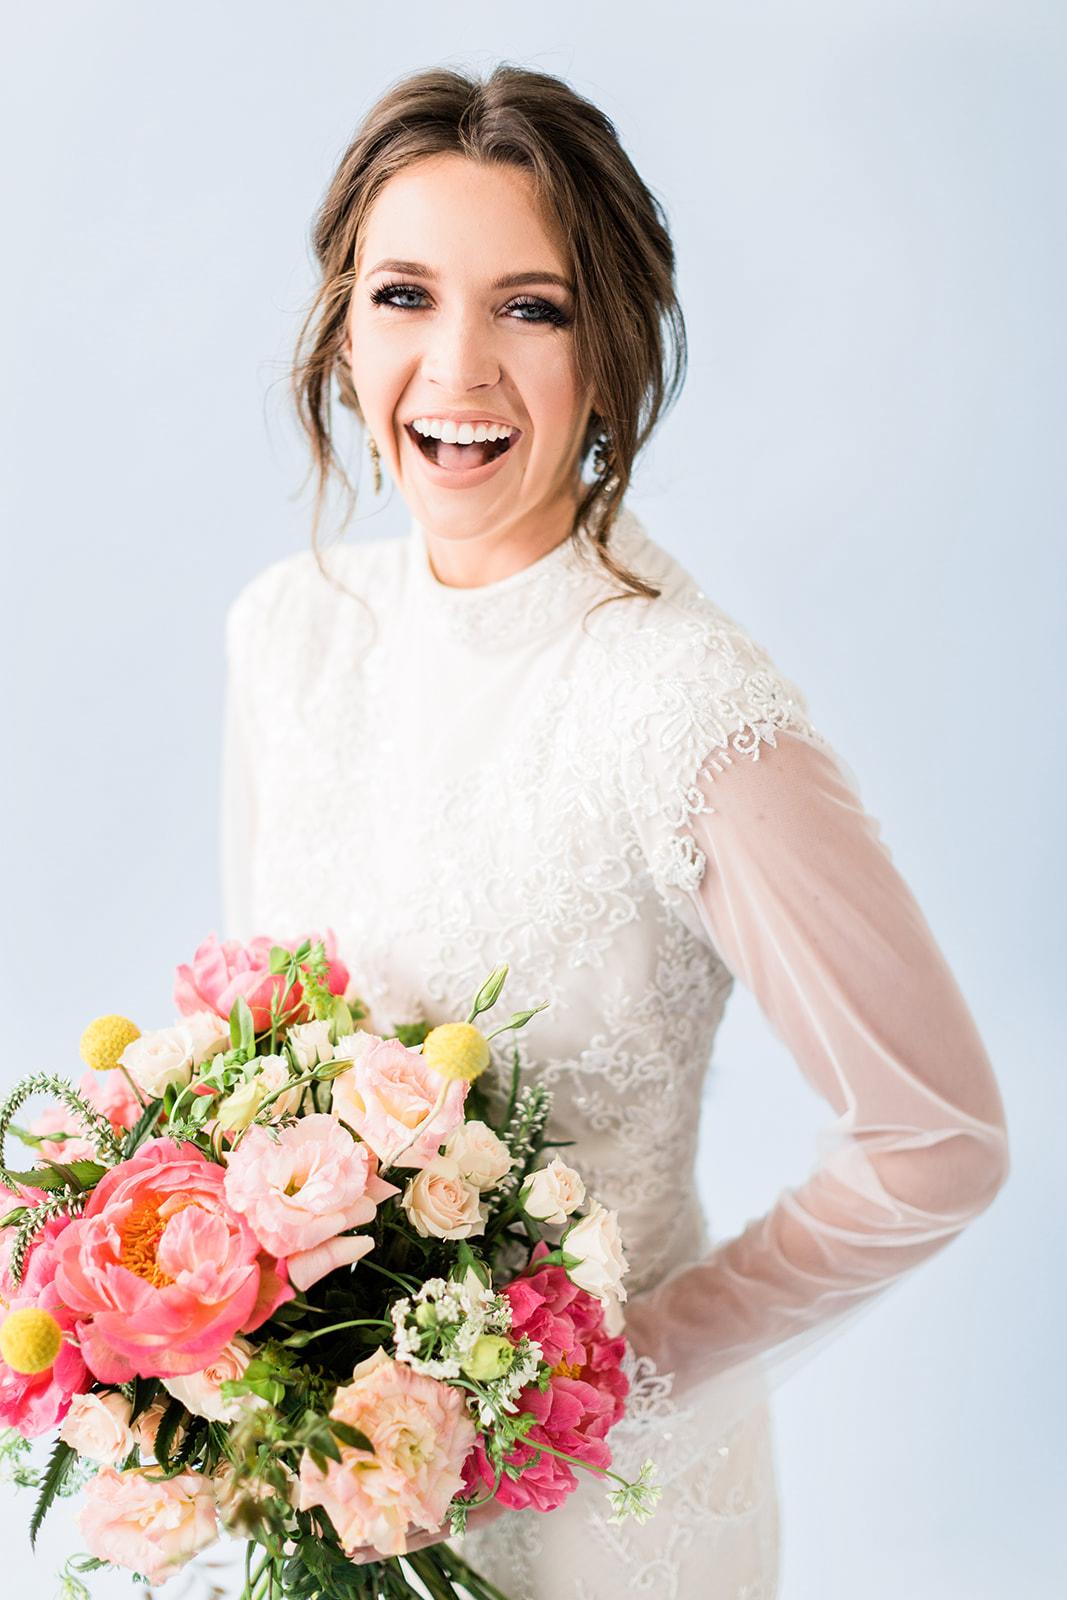 Fine-Art-Bridal-Shoot-Blushed-01-2.jpg